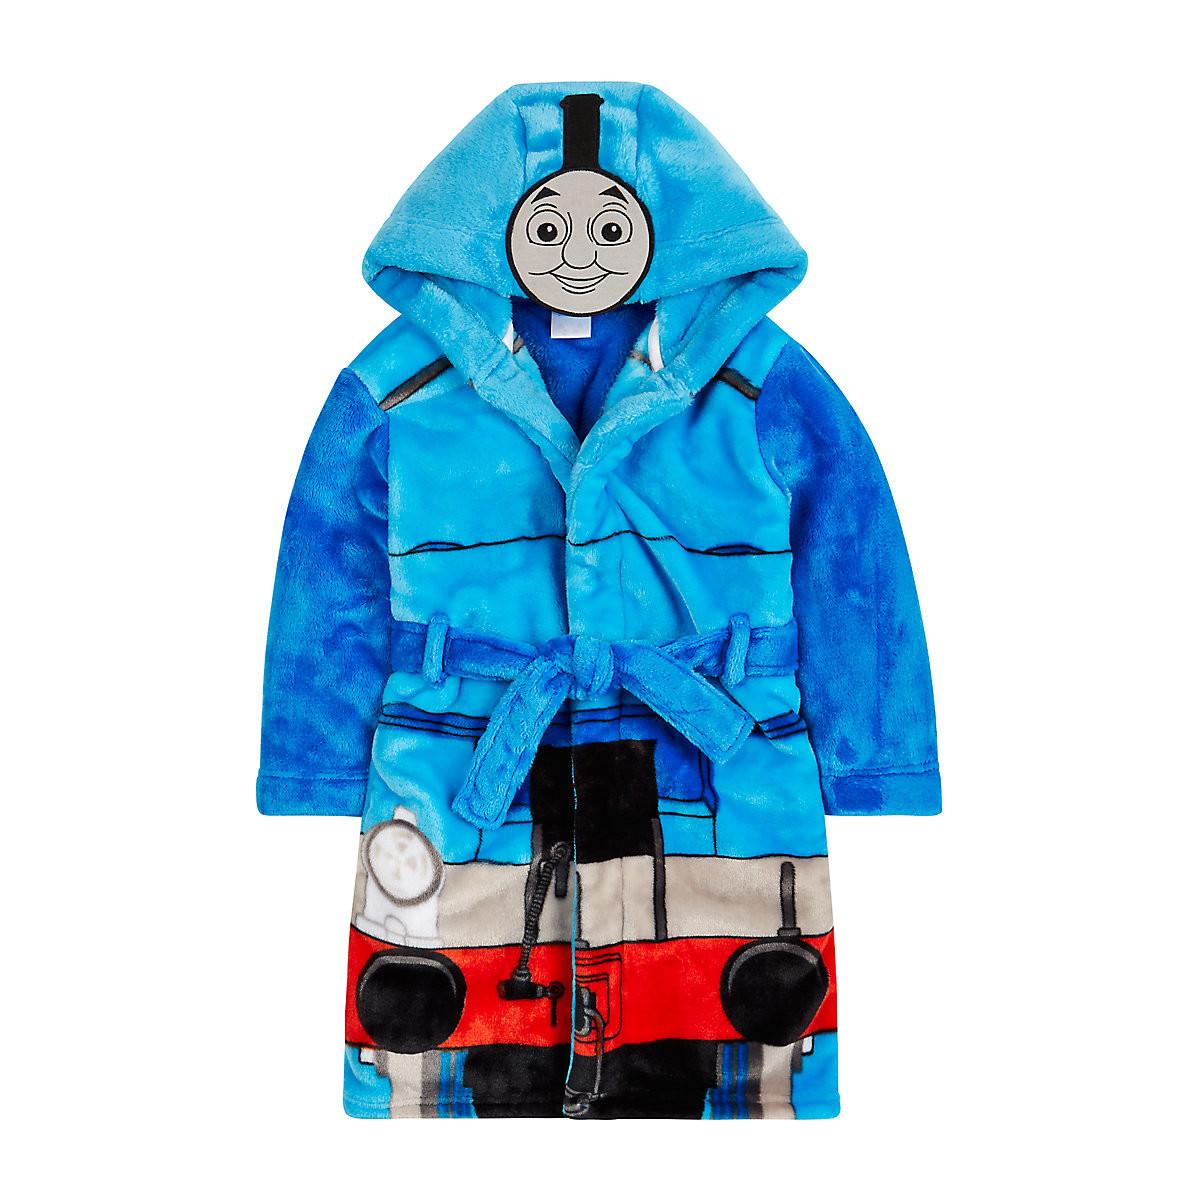 Boys Thomas Tank Engine Dressing Gown Bath Robe Age 2-3